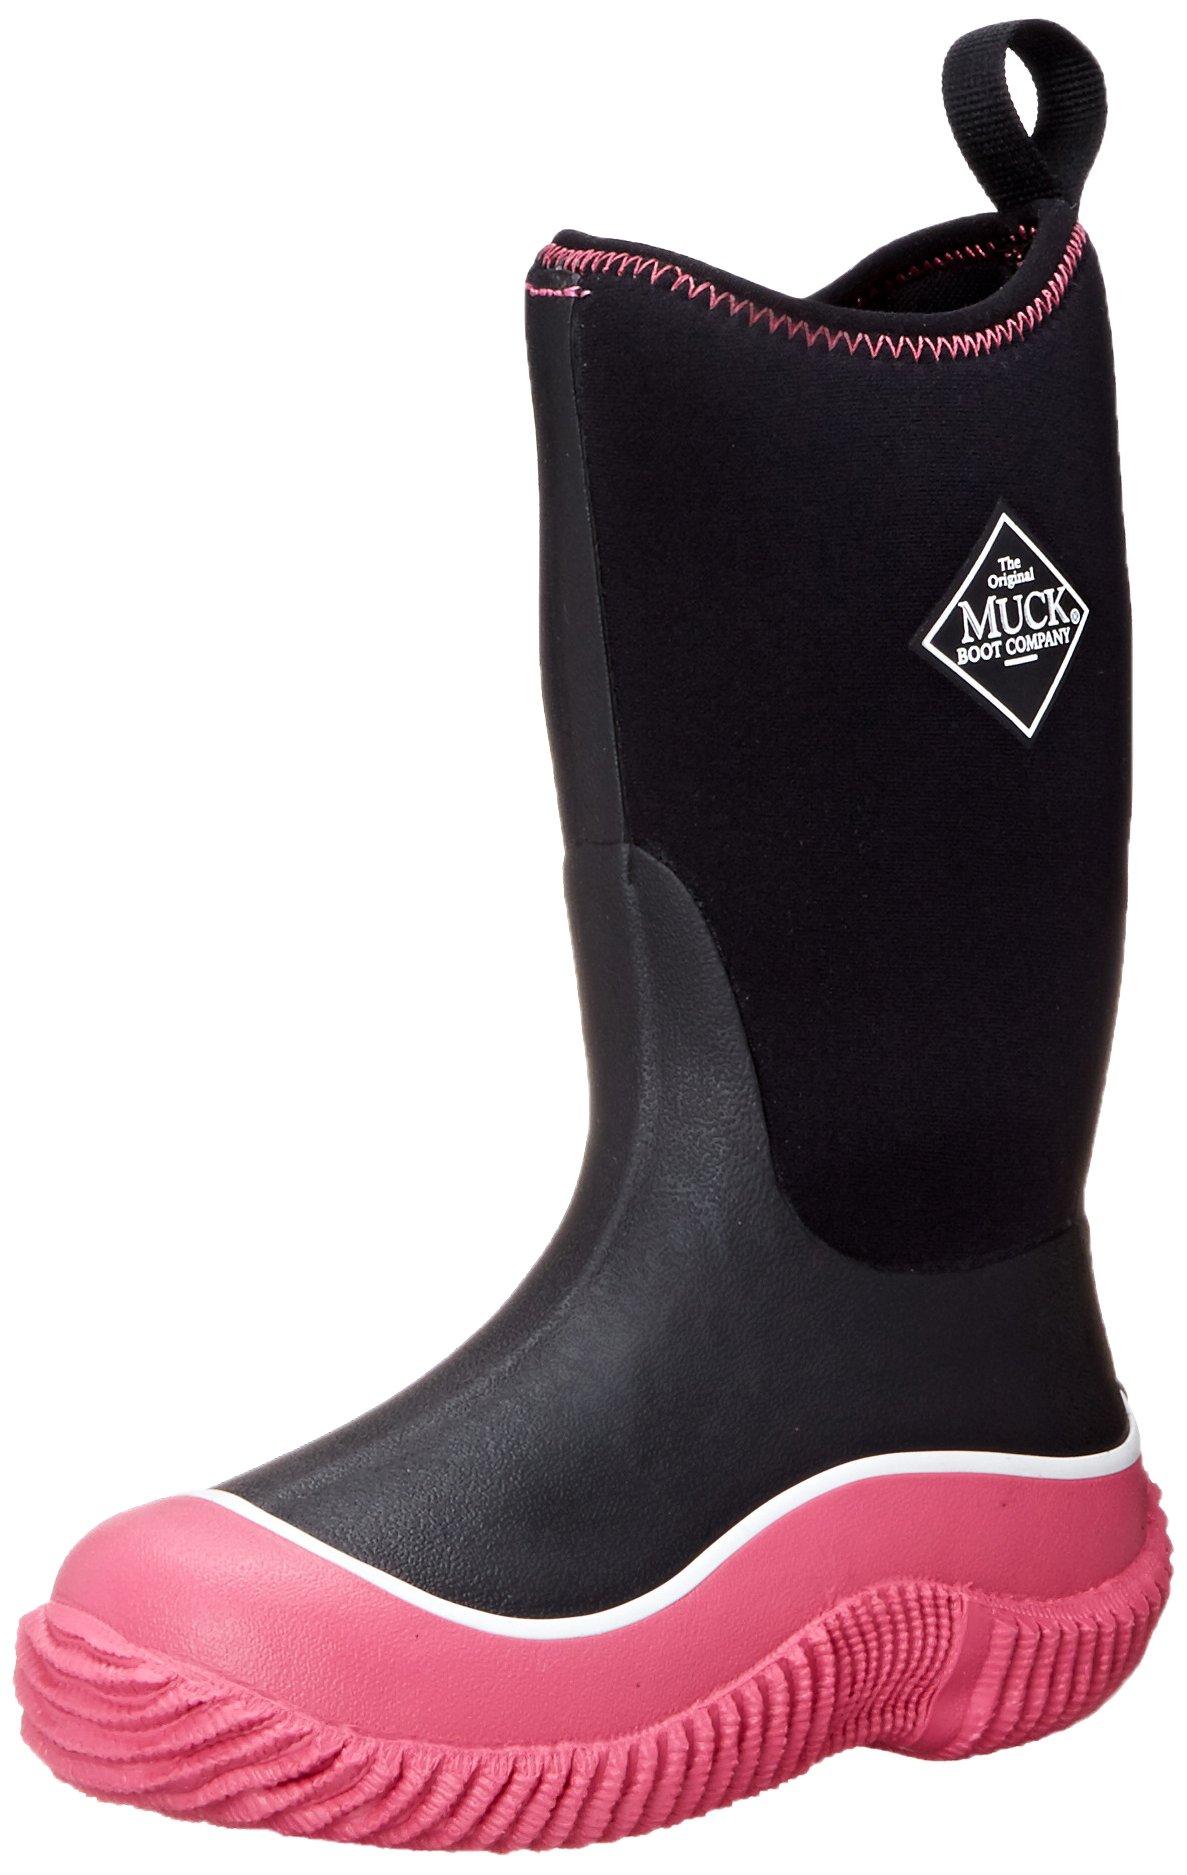 Muck Boot Girls Kids Hale Sport Boot Black/Pink Size 13